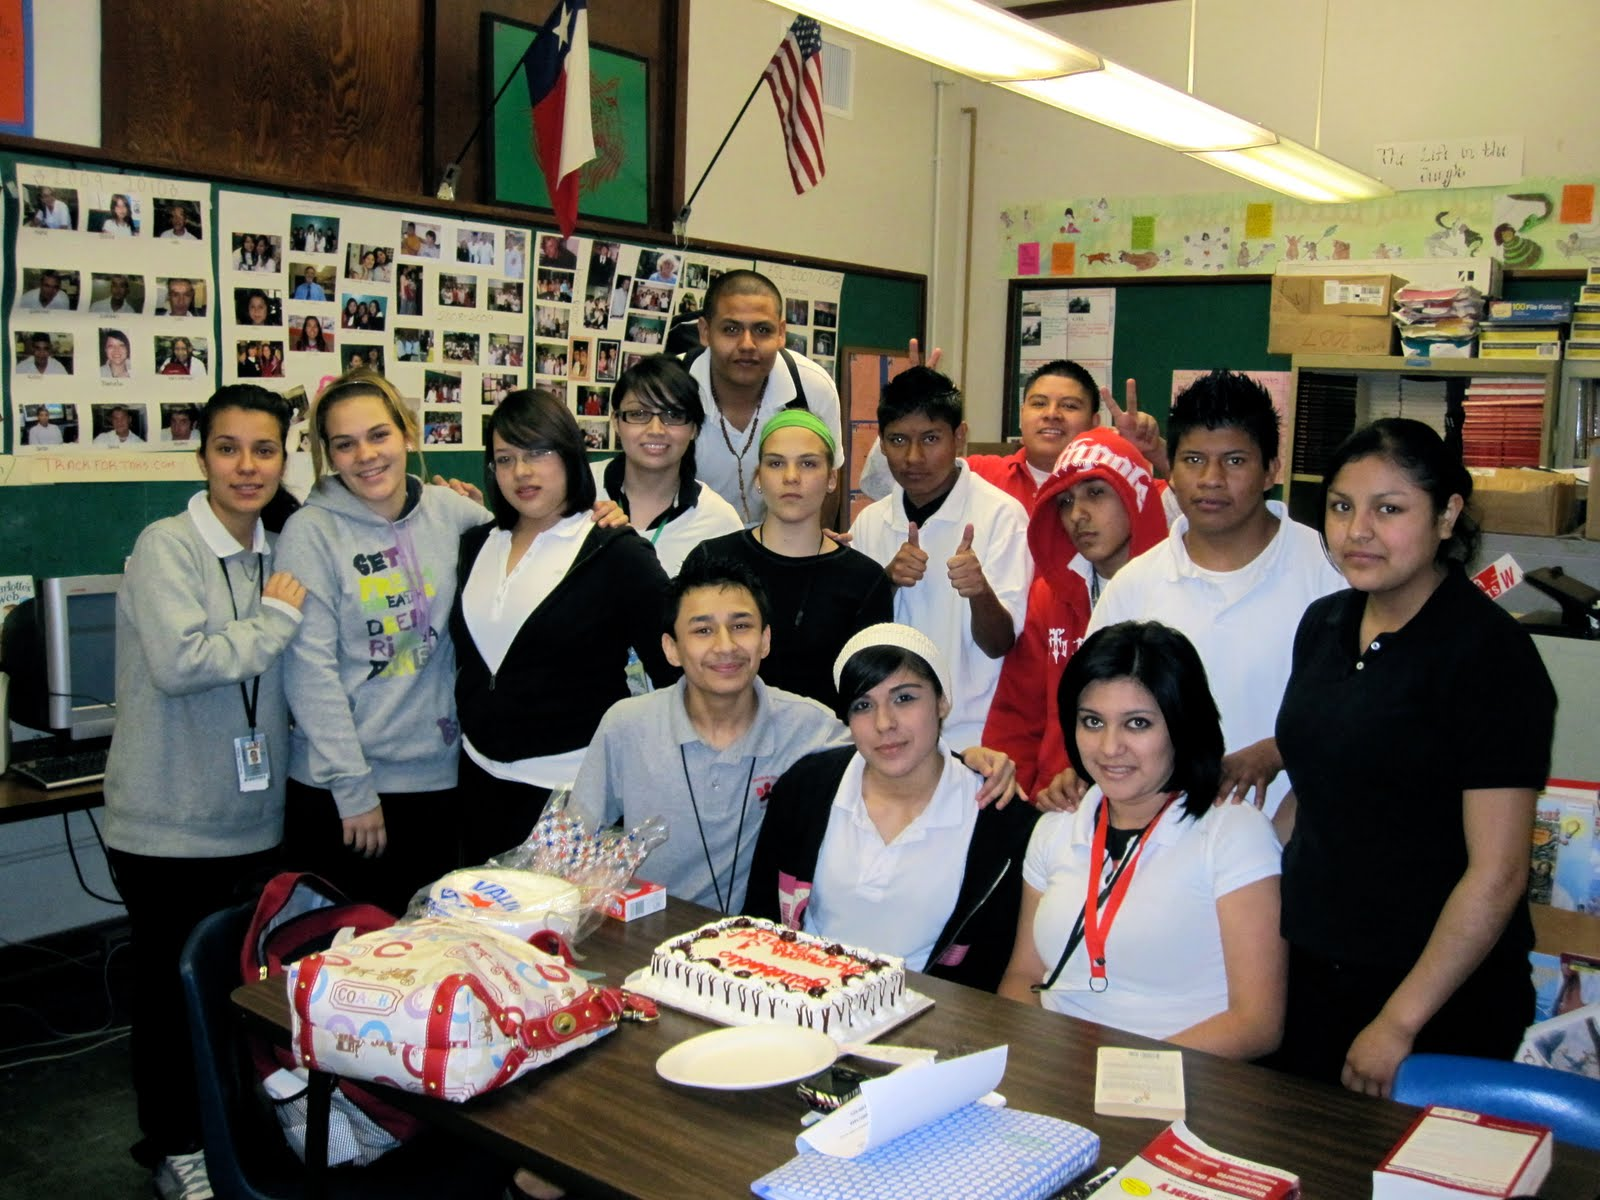 Esl Classes For High School Students